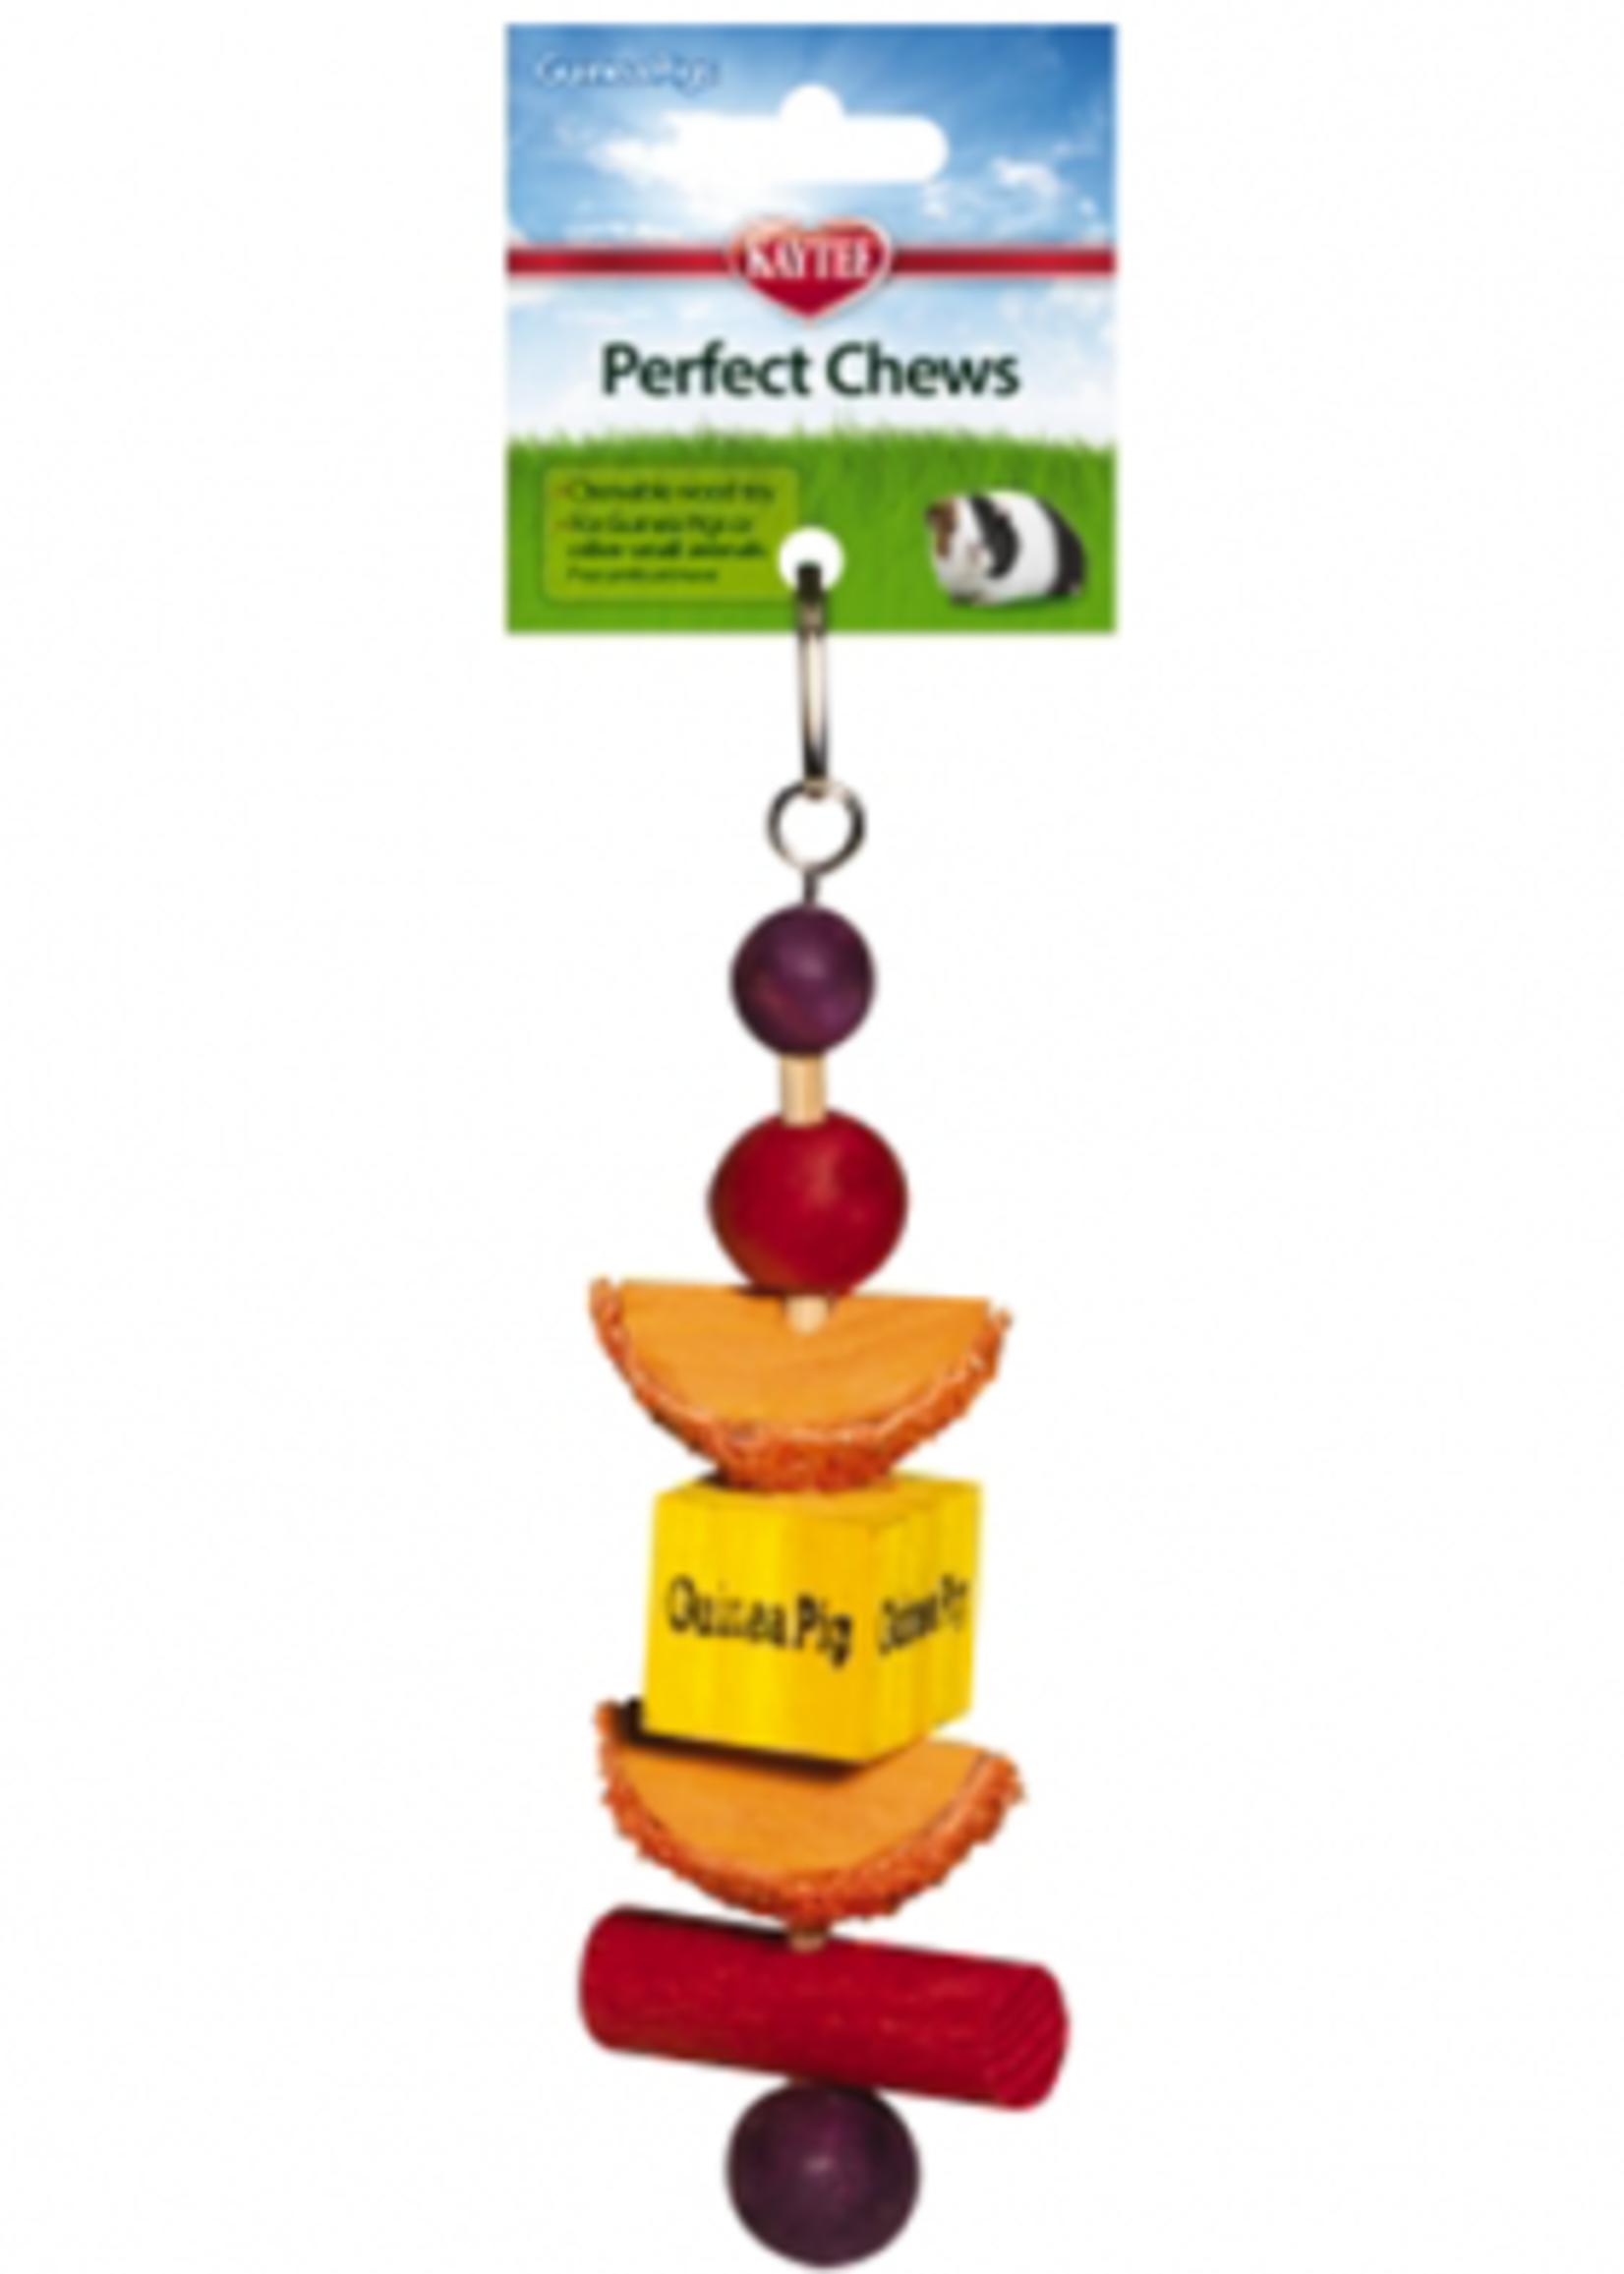 Kaytee® Kaytee® Perfect Chews for Guinea Pigs